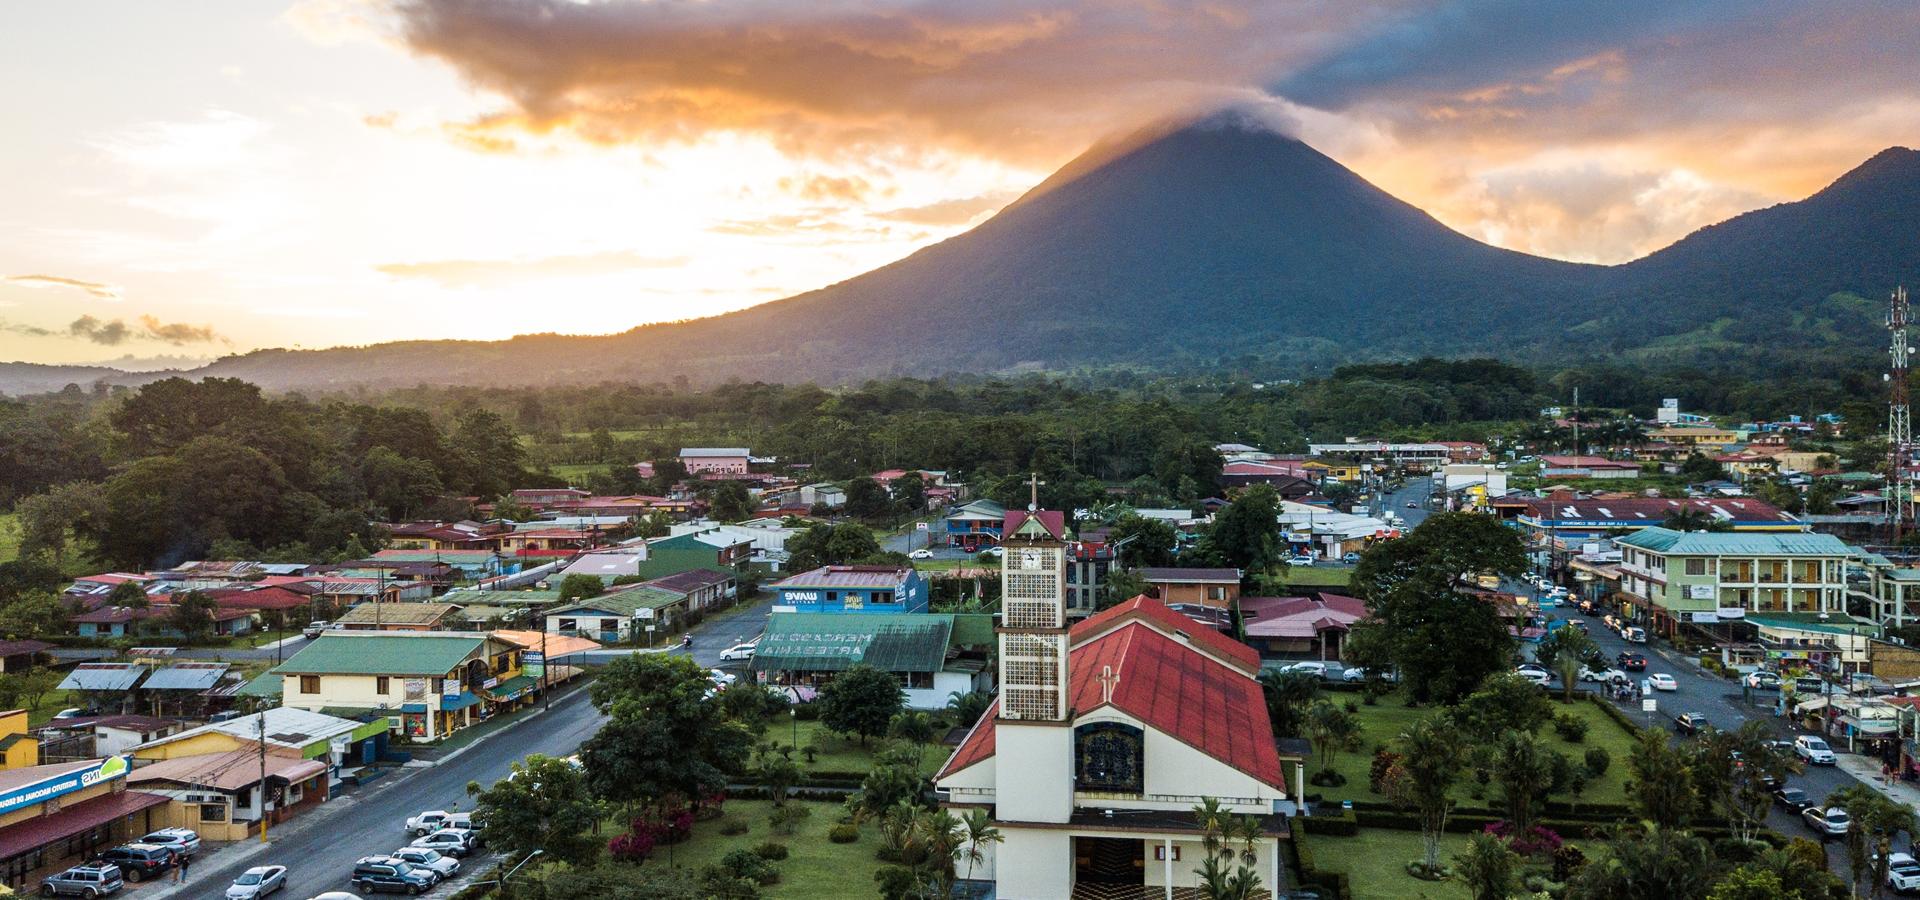 <b>La Fortuna, Alajuela Province, Costa Rica</b>